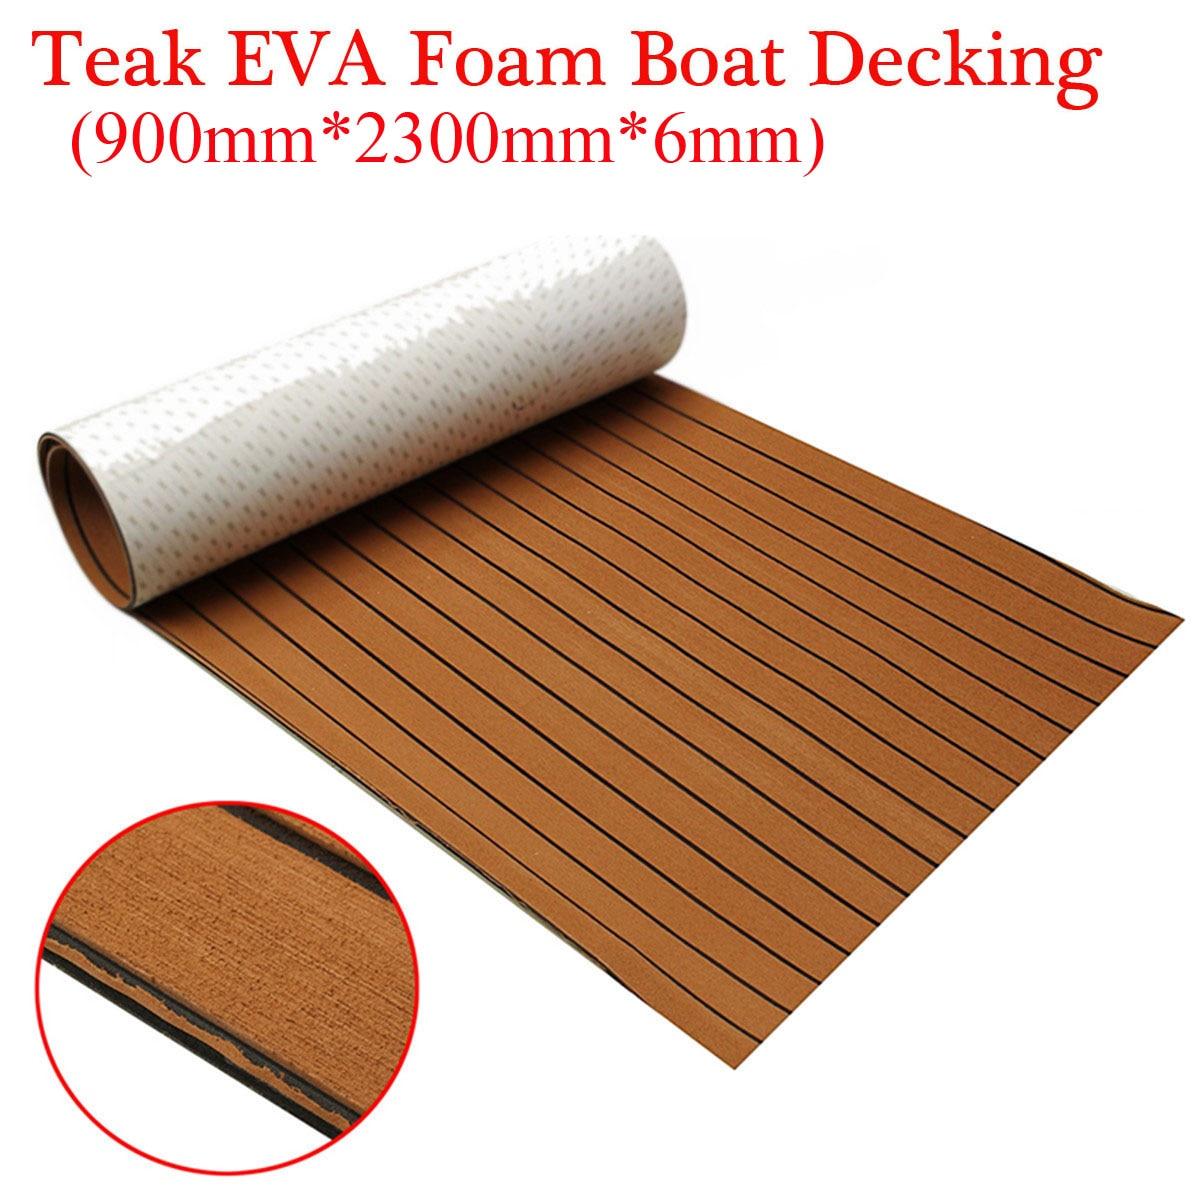 900x2300x6mm Self-Adhesive EVA Foam Teak Brown With Black Line Faux Teak Boat Decking Sheet